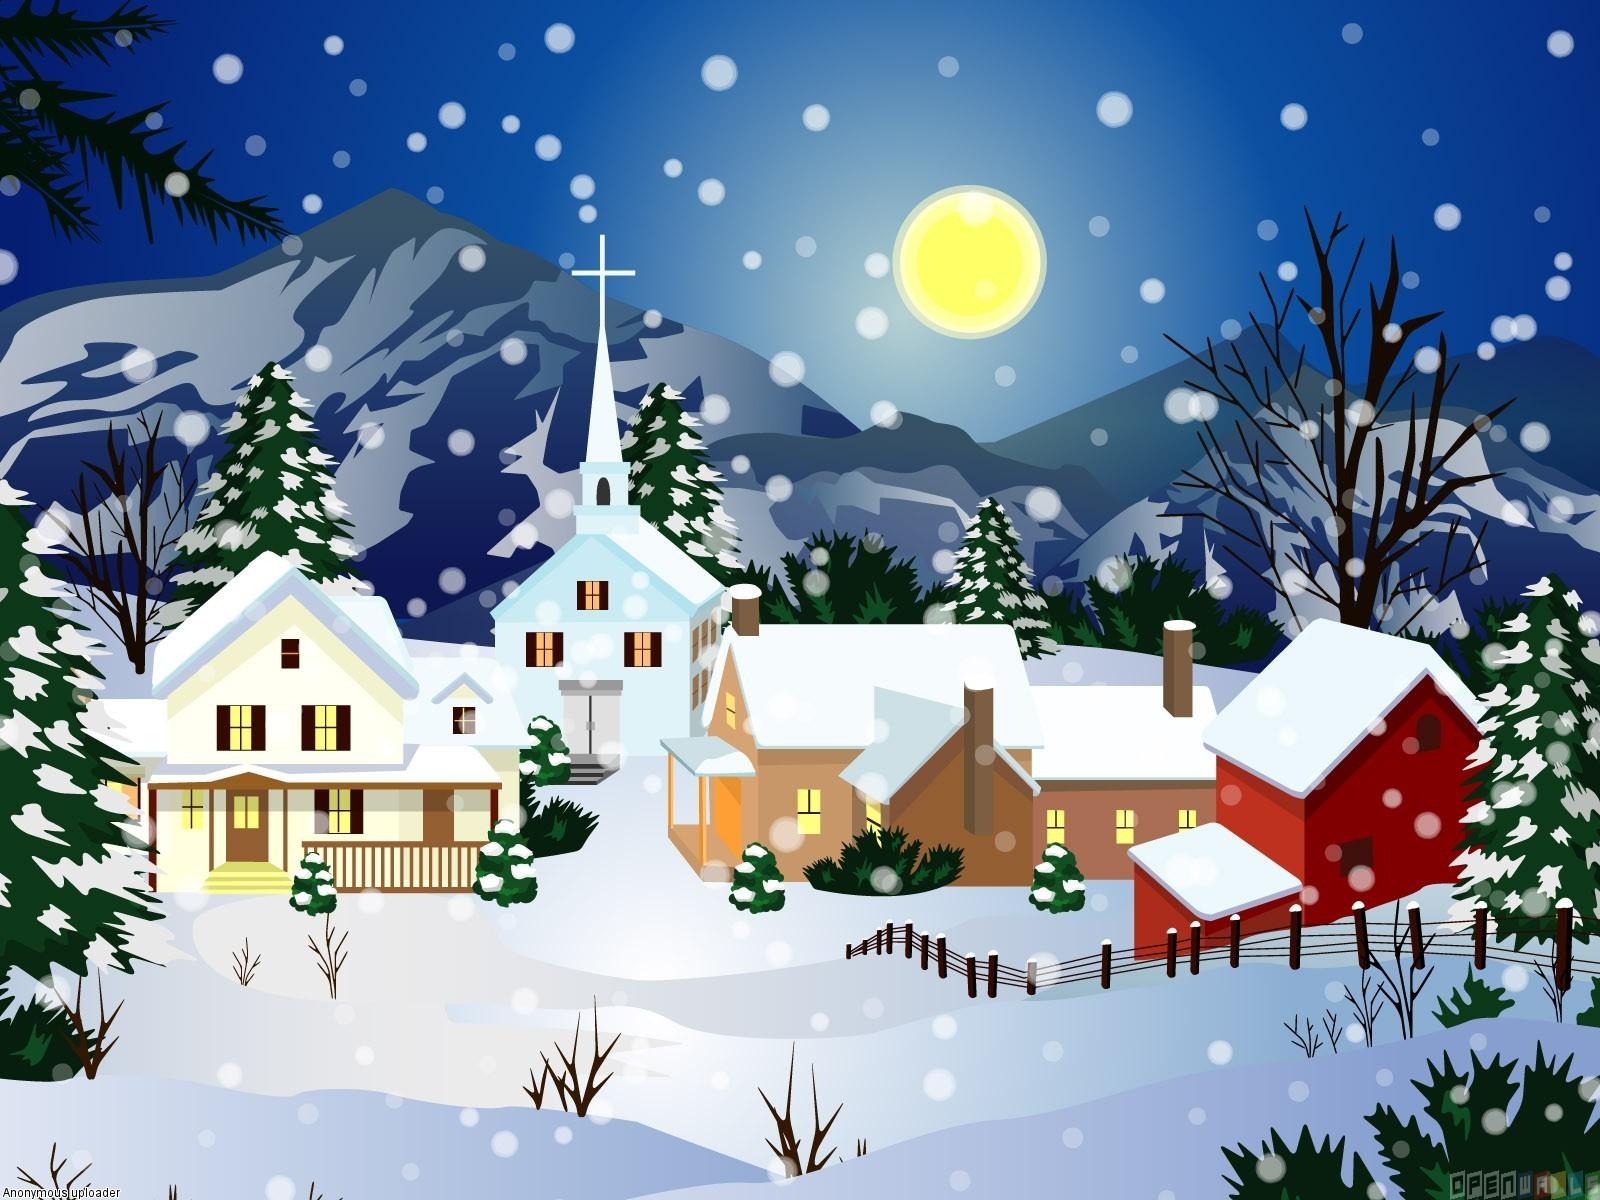 Silent night christmas carol music and lyrics midnight for Christmas house music